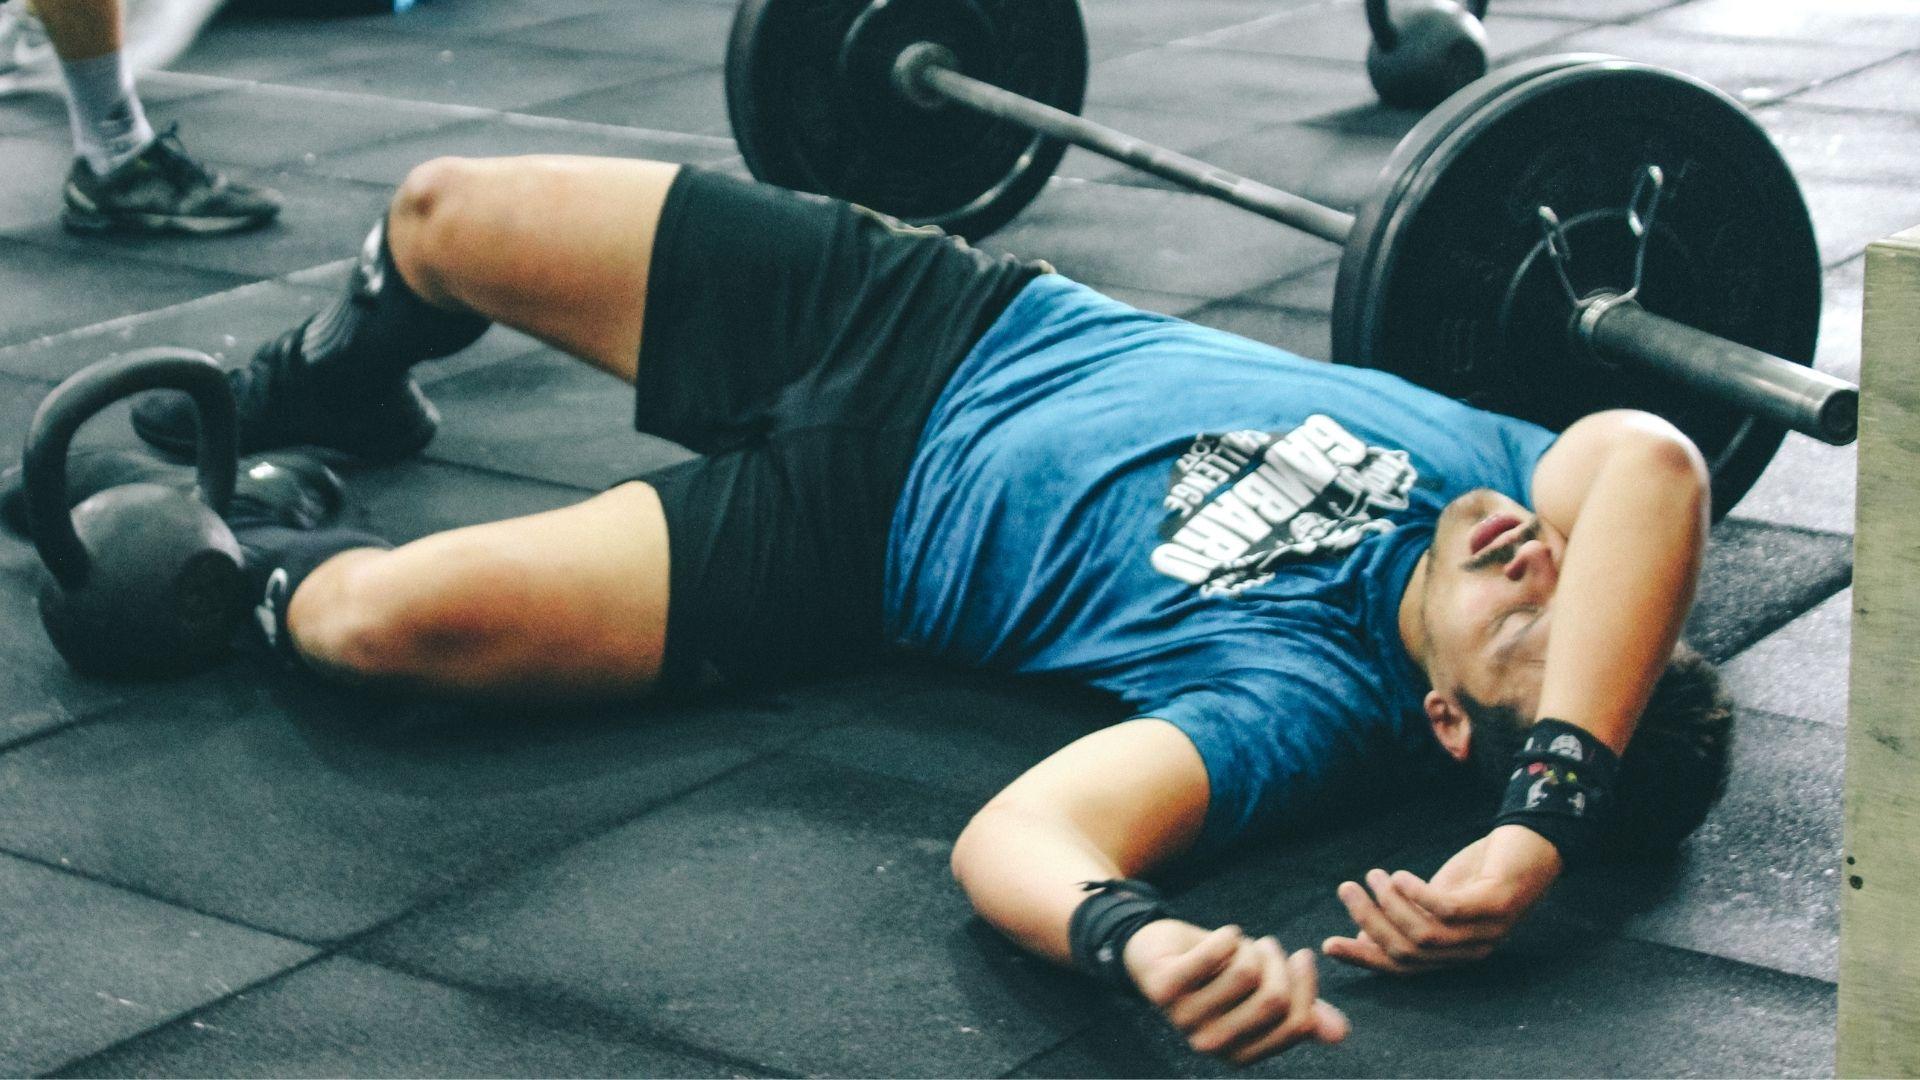 HIIT - High Intensity Intervall Training